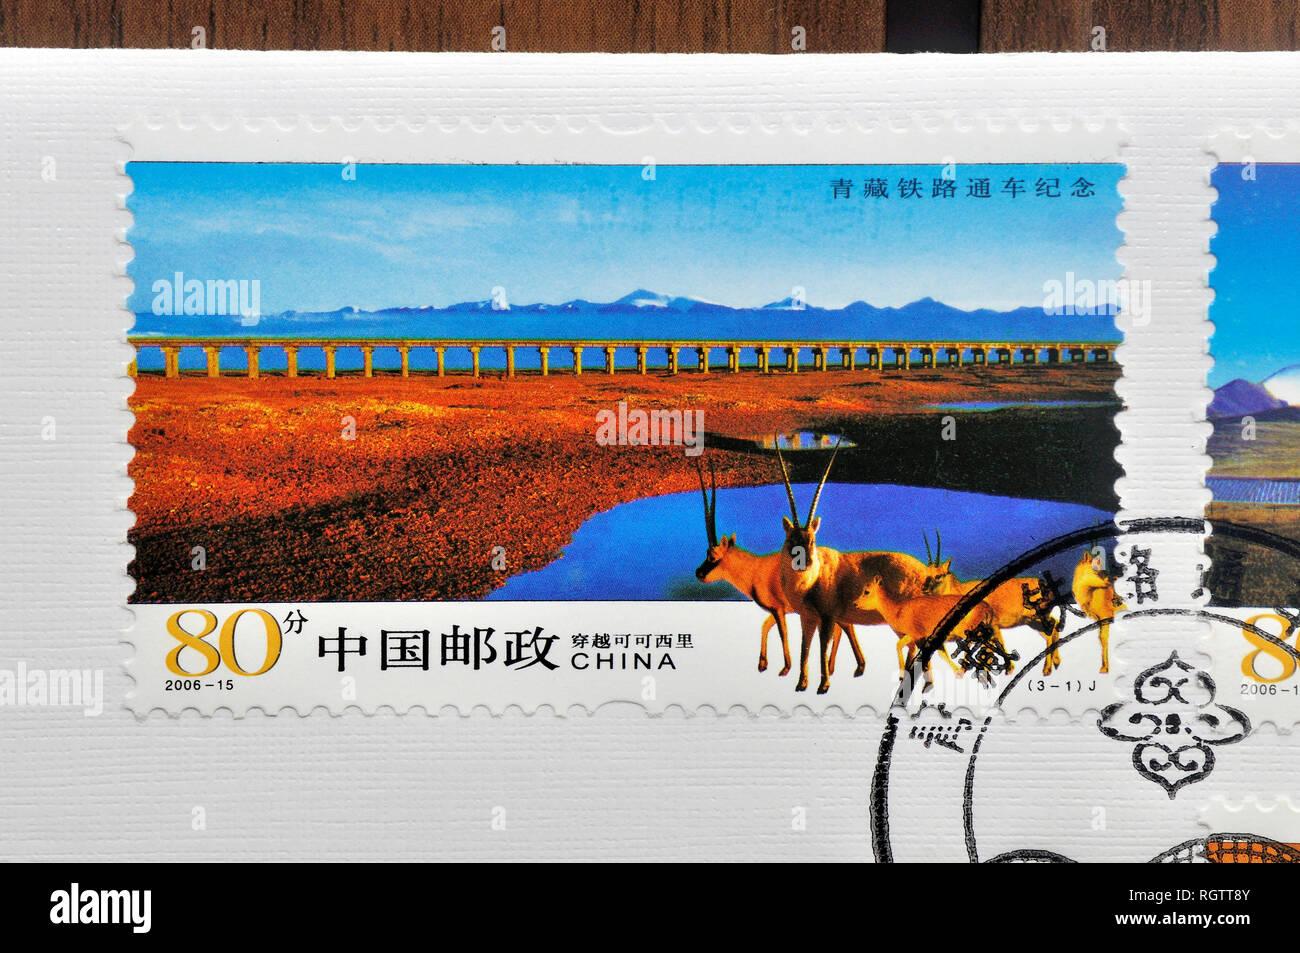 CHINA - CIRCA 2006: A stamp printed in China shows 2006-15 Qinghai - Tibet railway Open to Traffic, circa 2006., circa 2006 - Stock Image